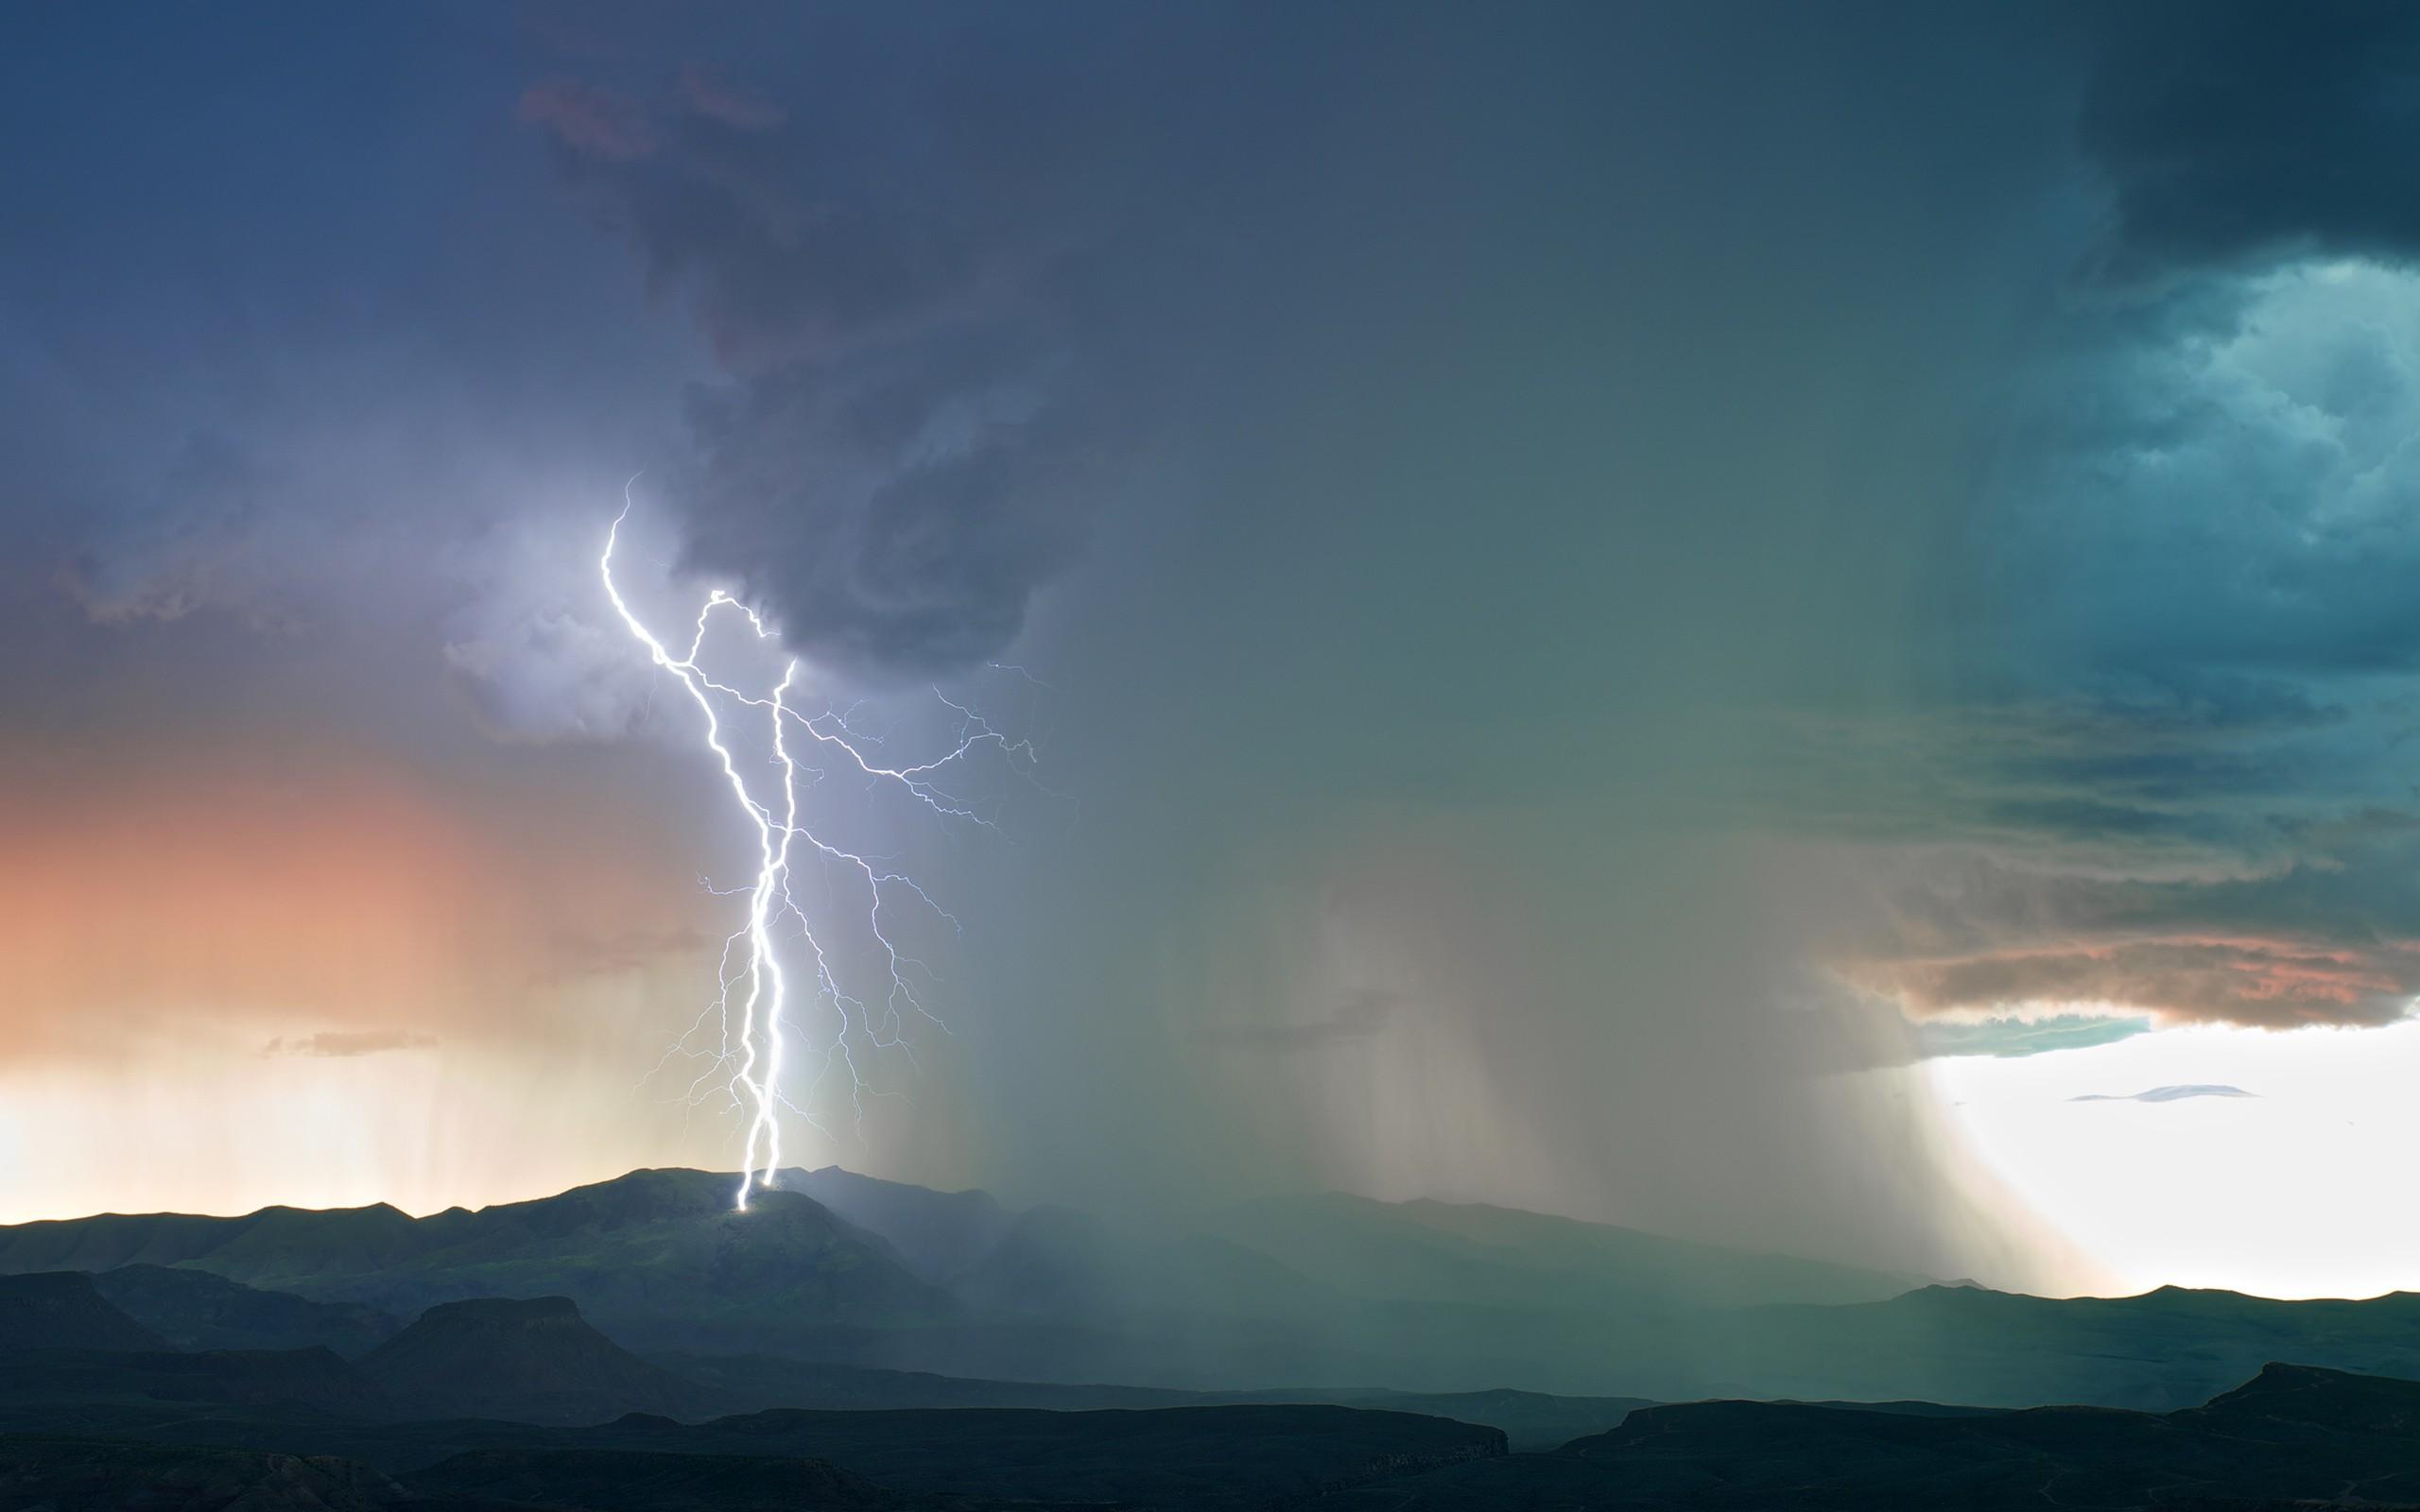 Wallpaper 2560x1600 Px Landscape Lightning Nature